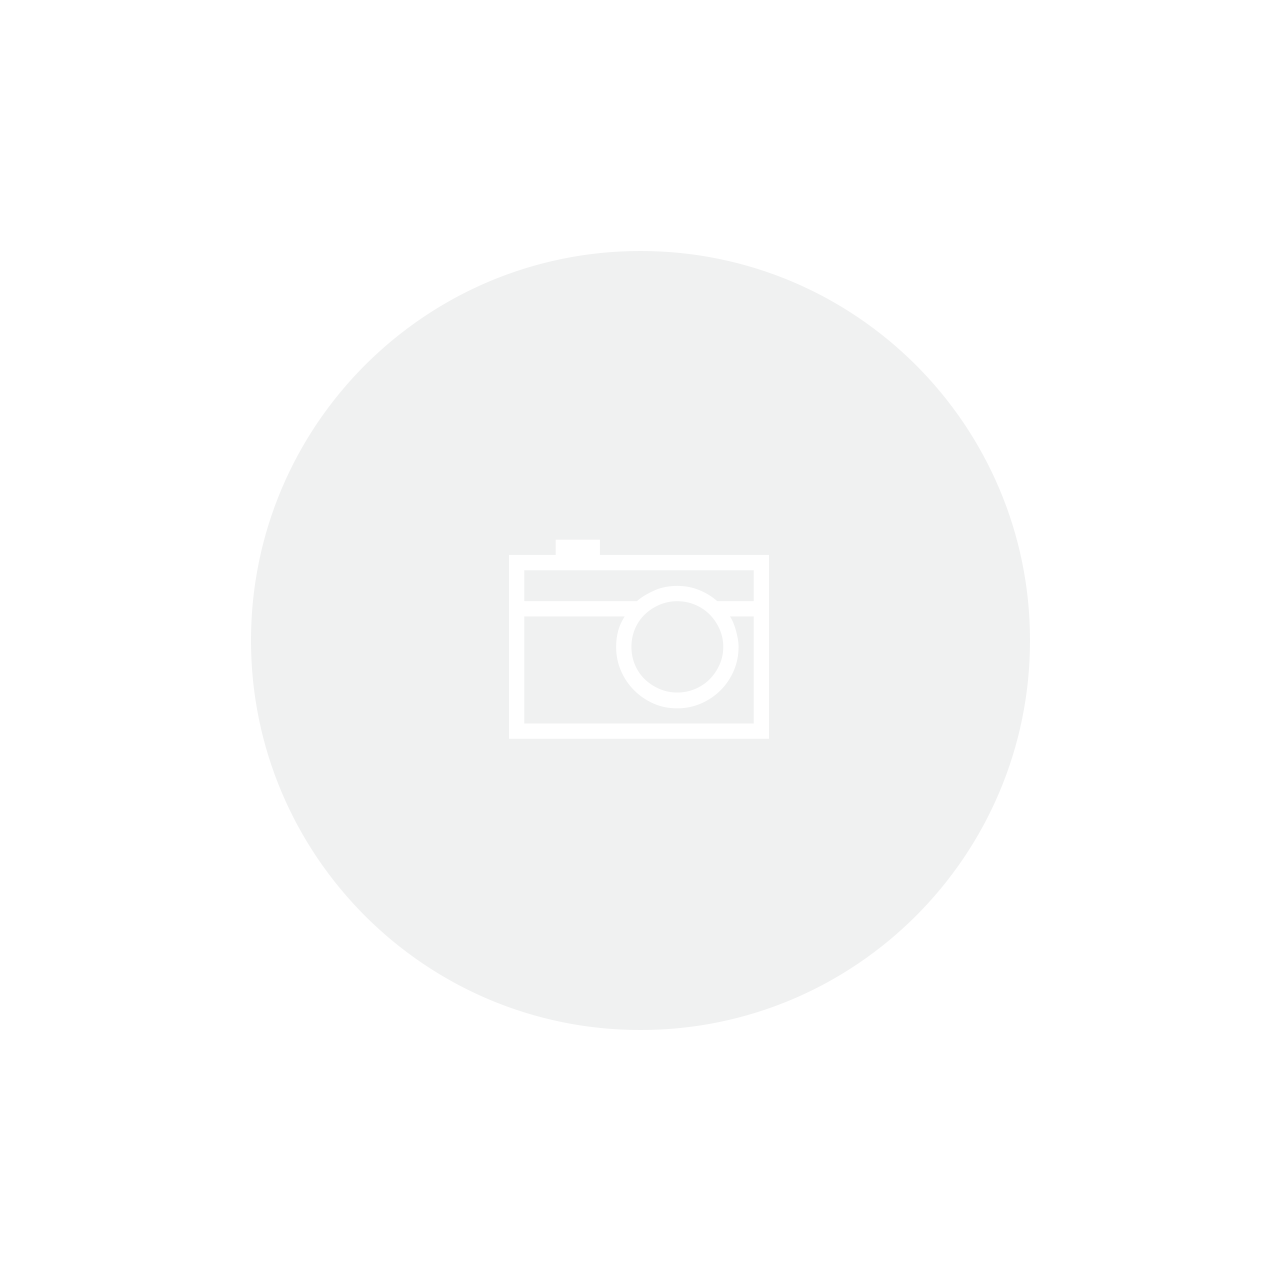 Bomboniere de Cristal Prima Luxo 16,5x18,4cm